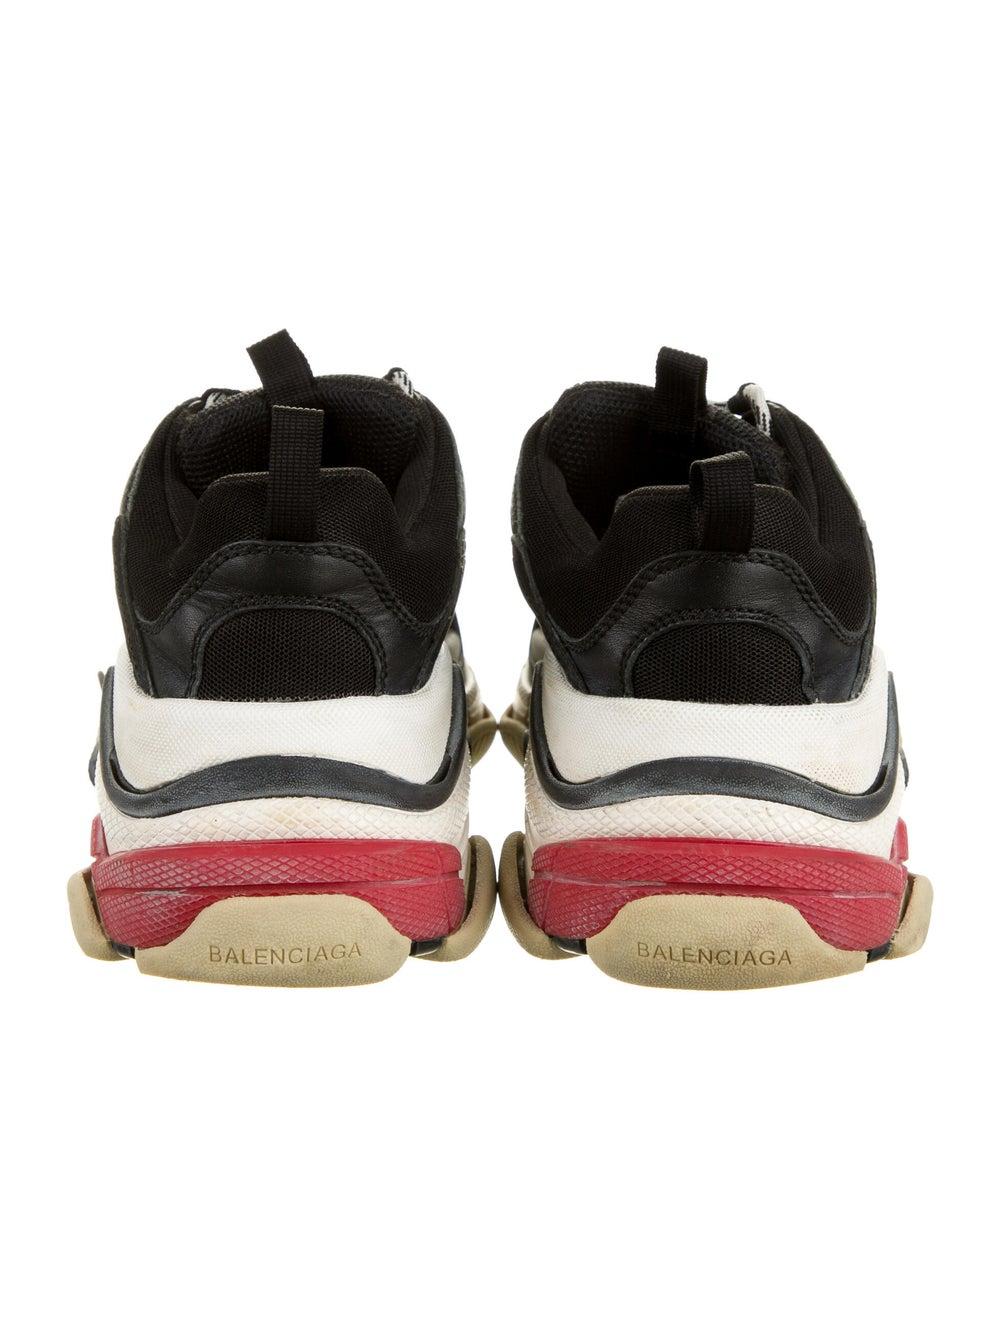 Balenciaga Triple S Chunky Sneakers Black - image 4